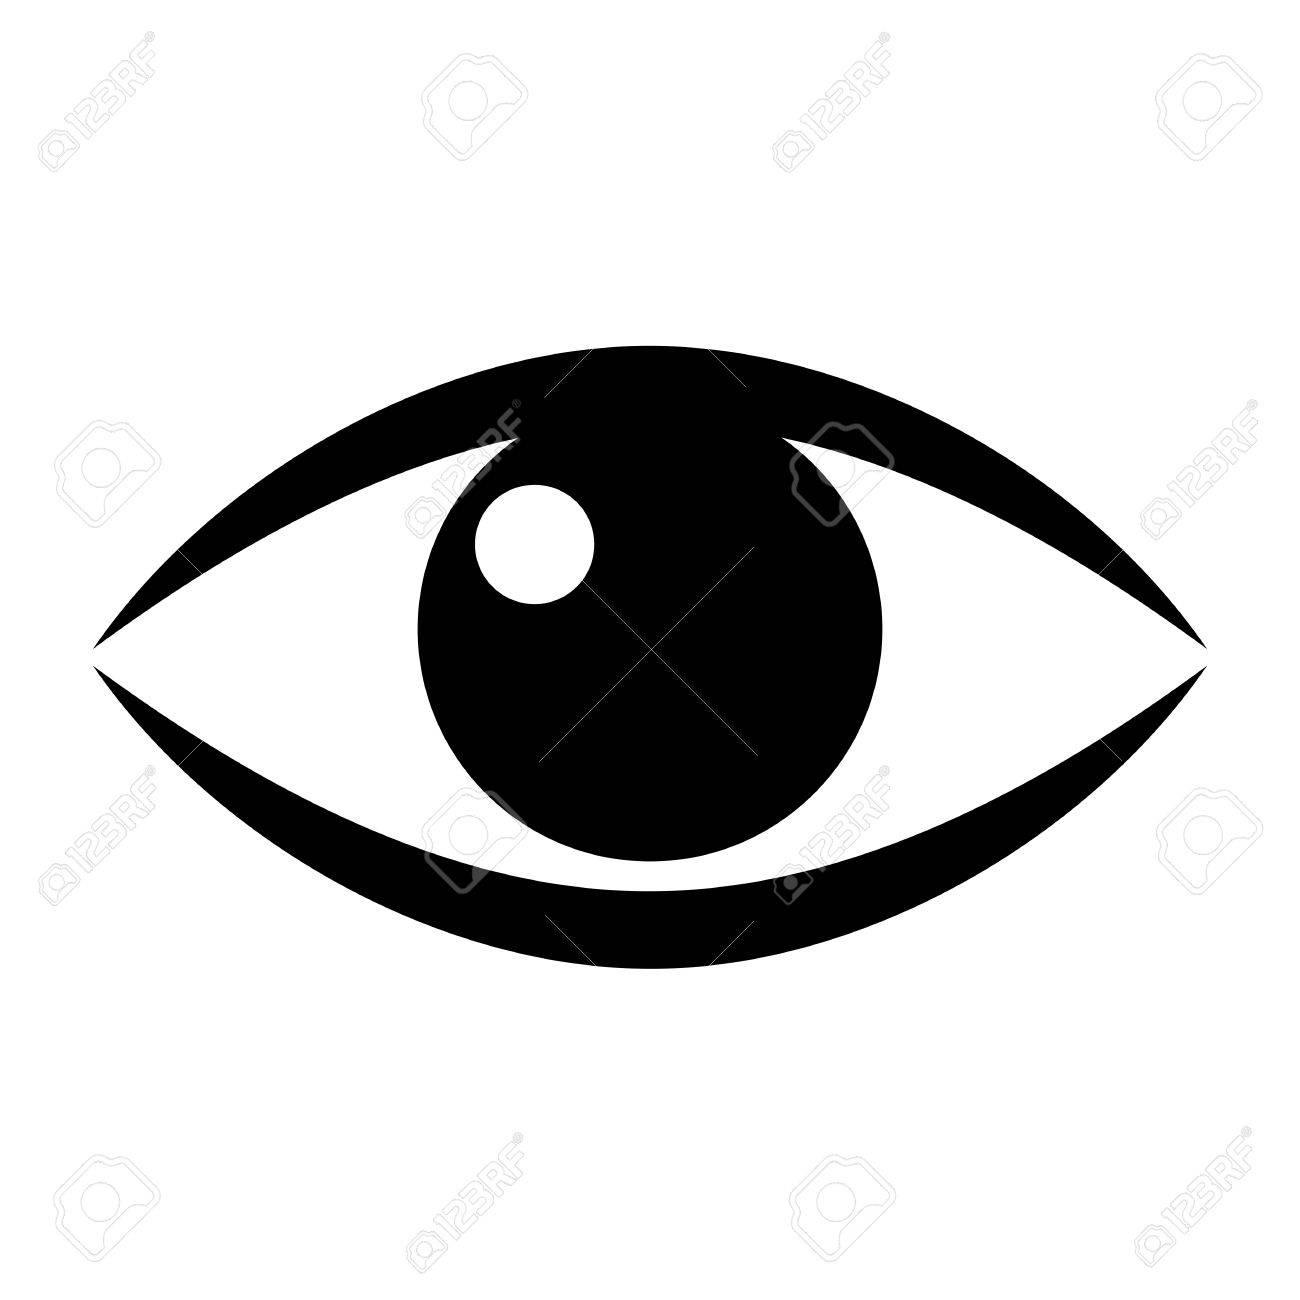 human eye vector icon royalty free cliparts vectors and stock rh 123rf com eye vector free eye vector free download